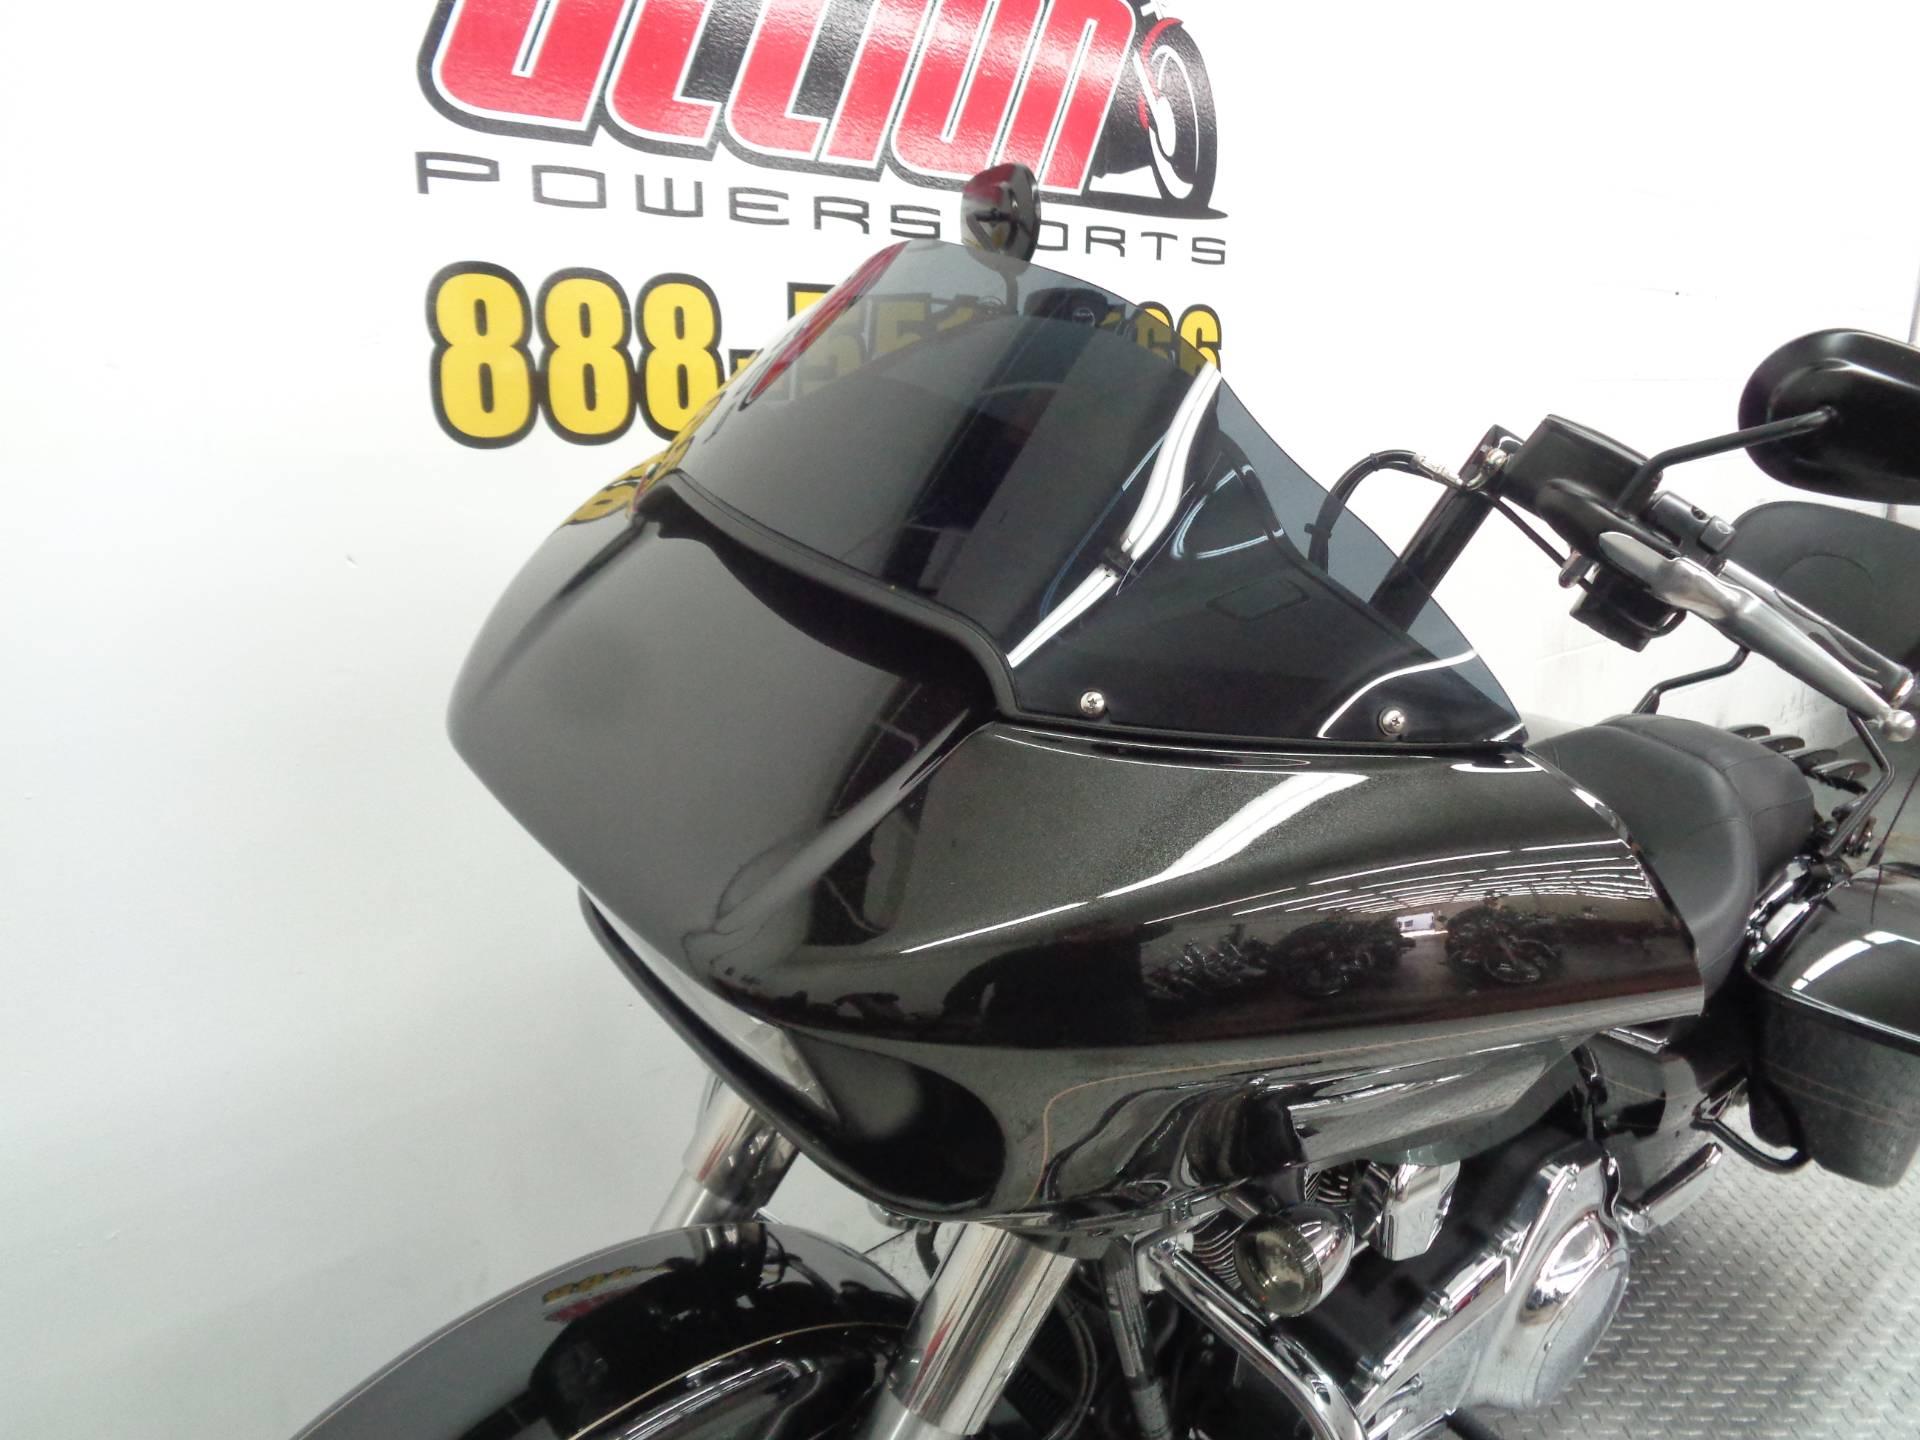 2016 Harley-Davidson Road Glide Special 9